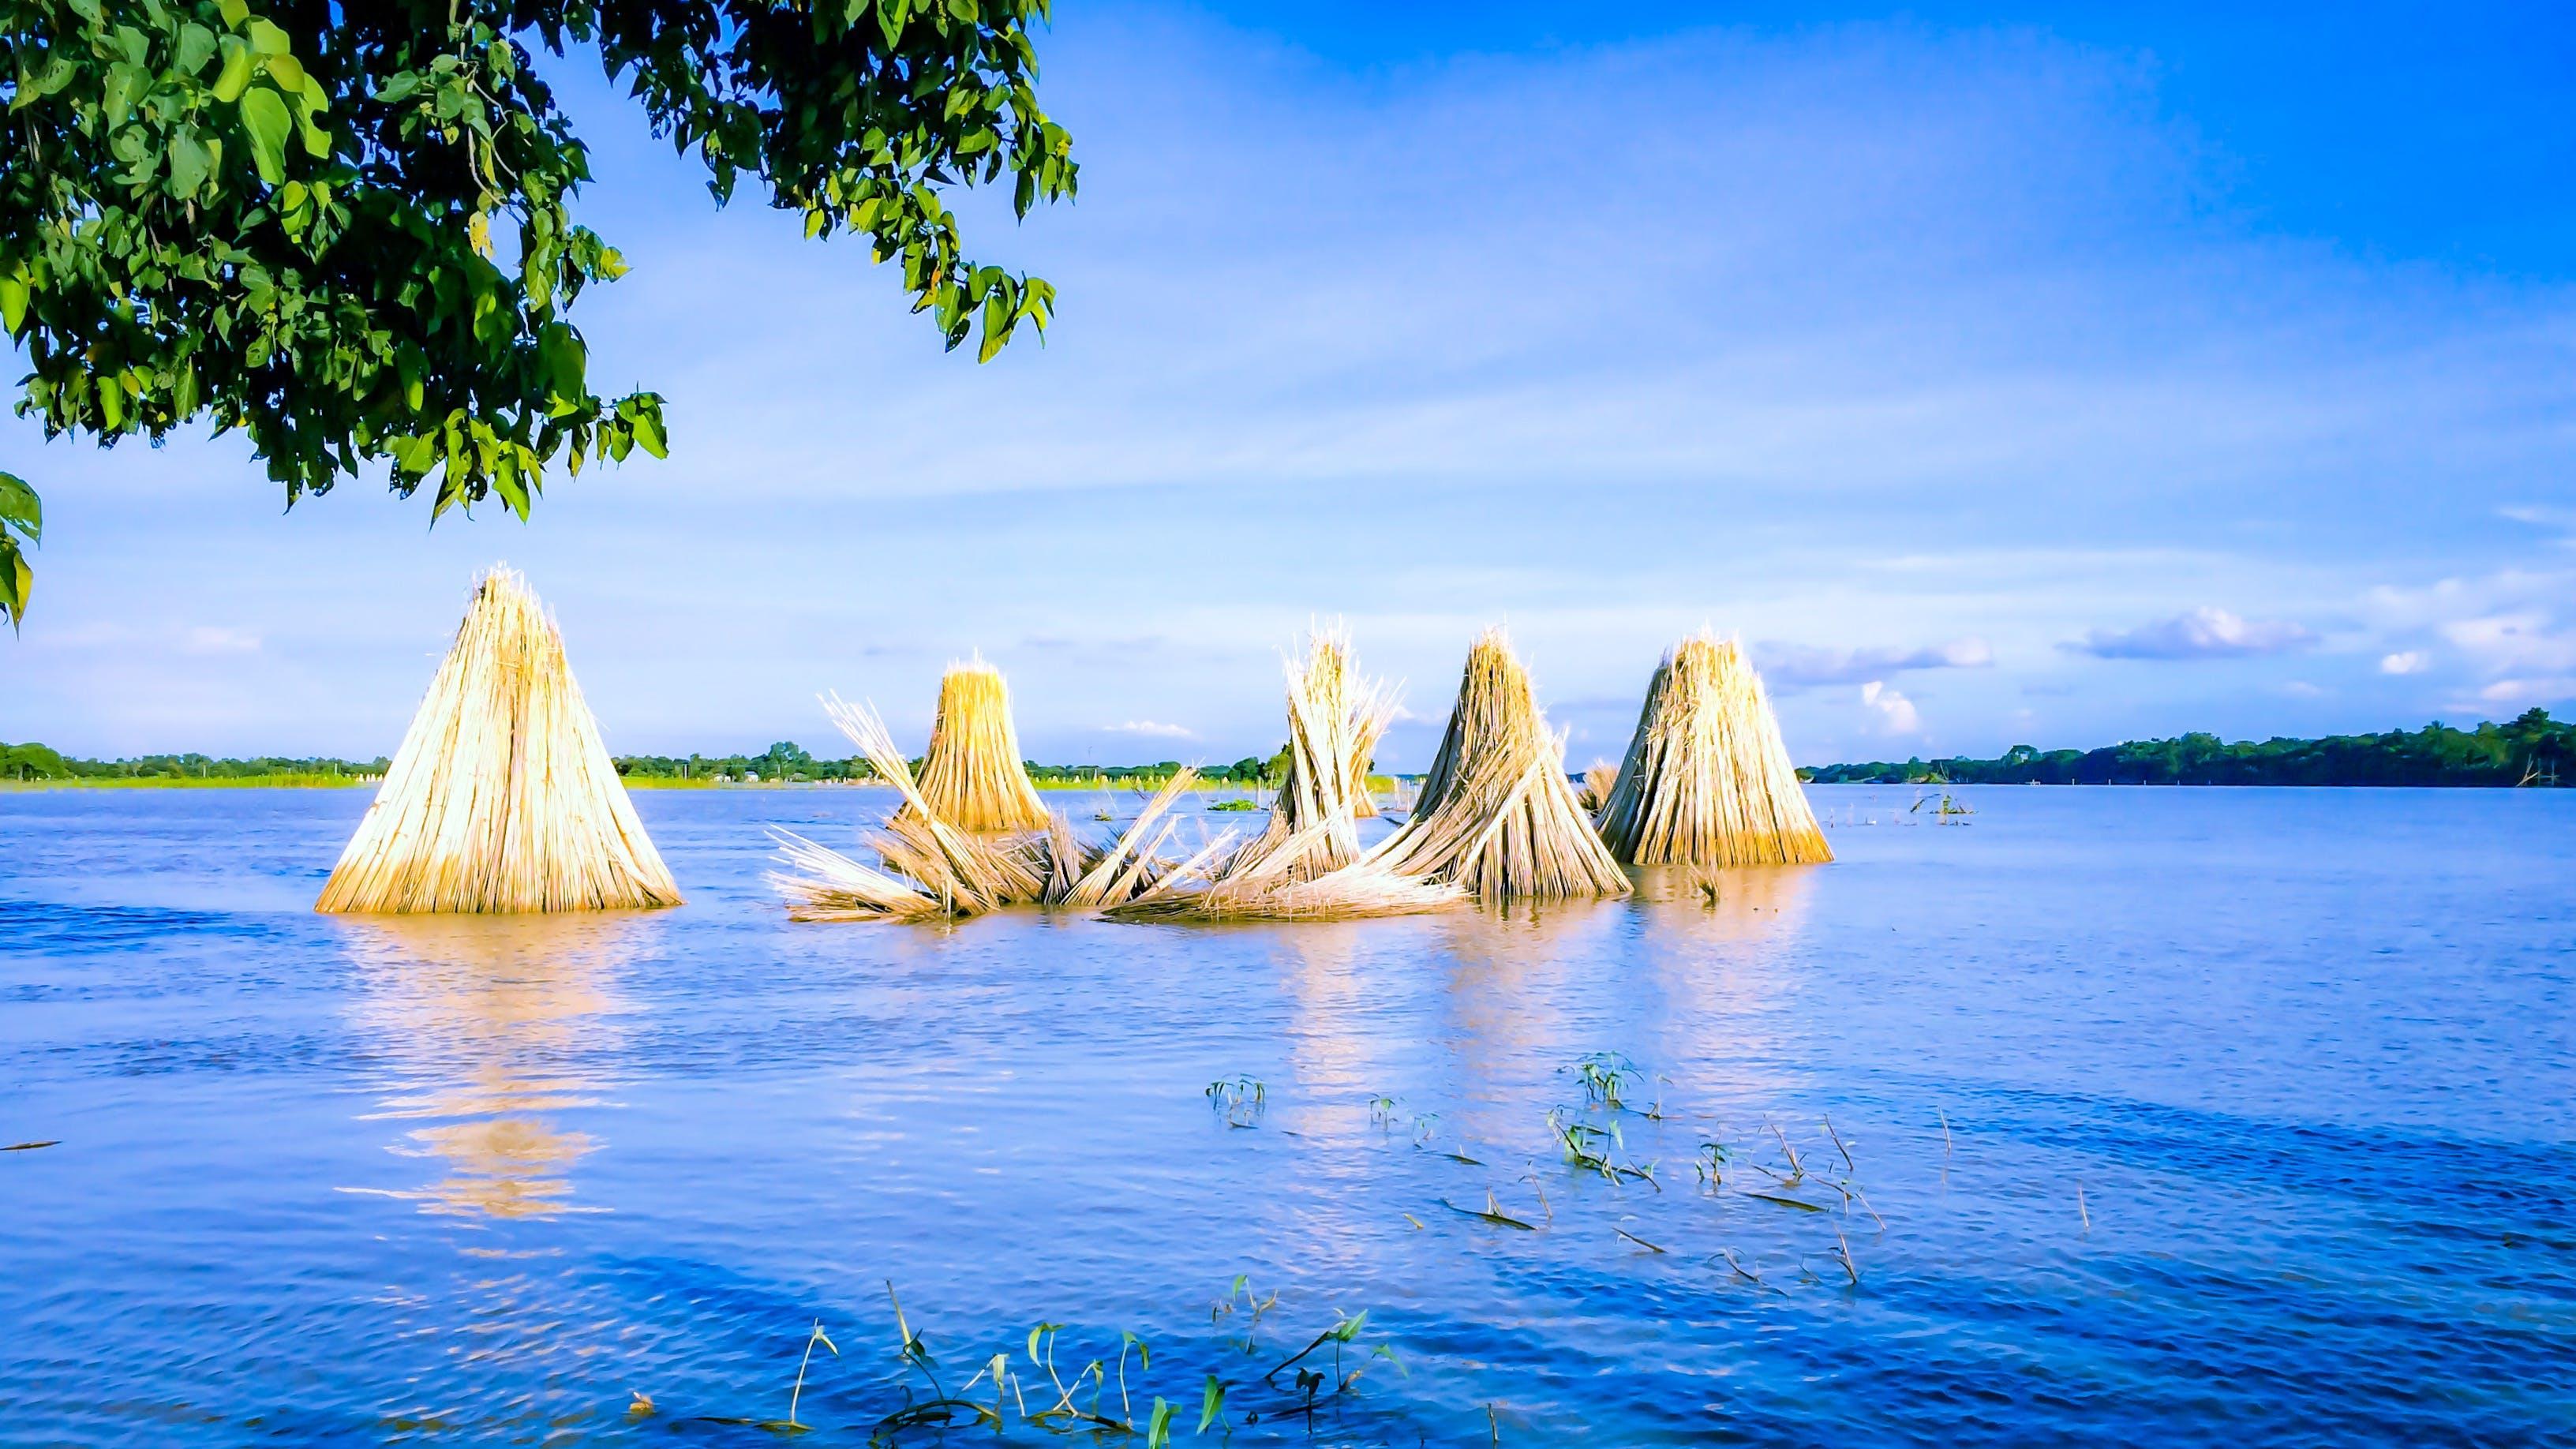 Free stock photo of rural, flooded, blue water, bangladesh